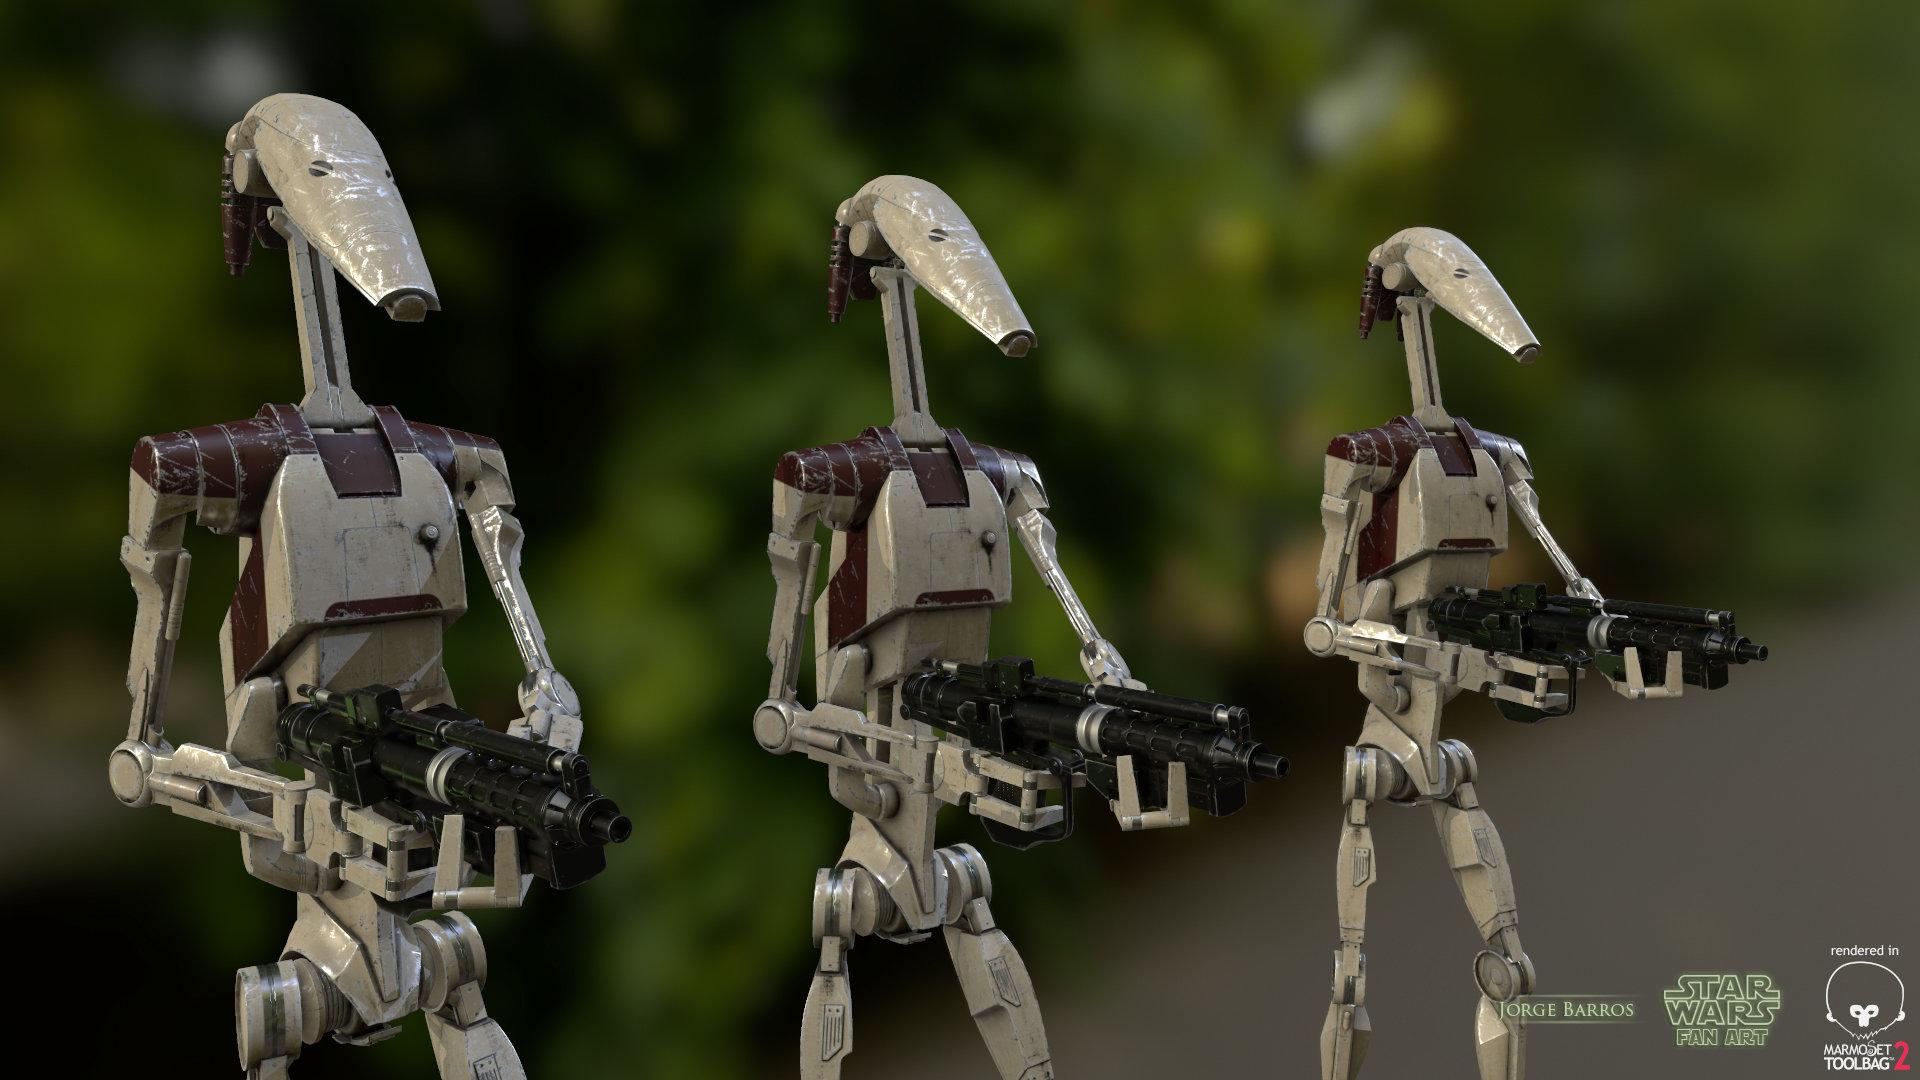 star wars droid wallpaper  ArtStation - Star Wars Battle Droid, Jorge Barros